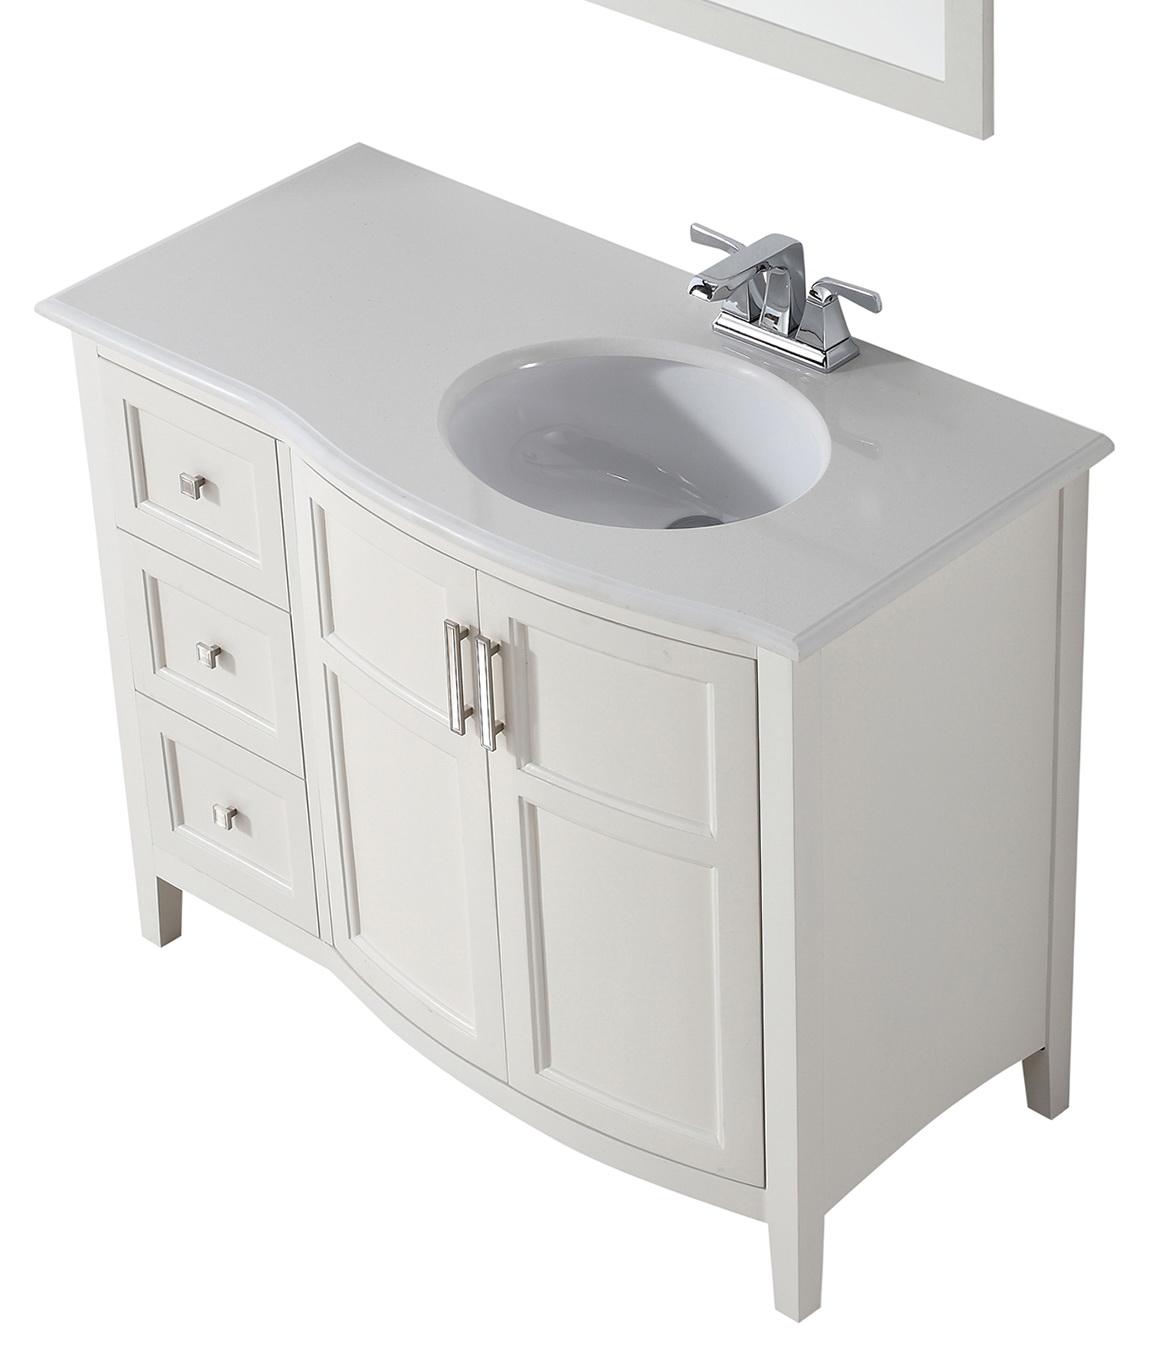 42 Inch Bathroom Vanity White